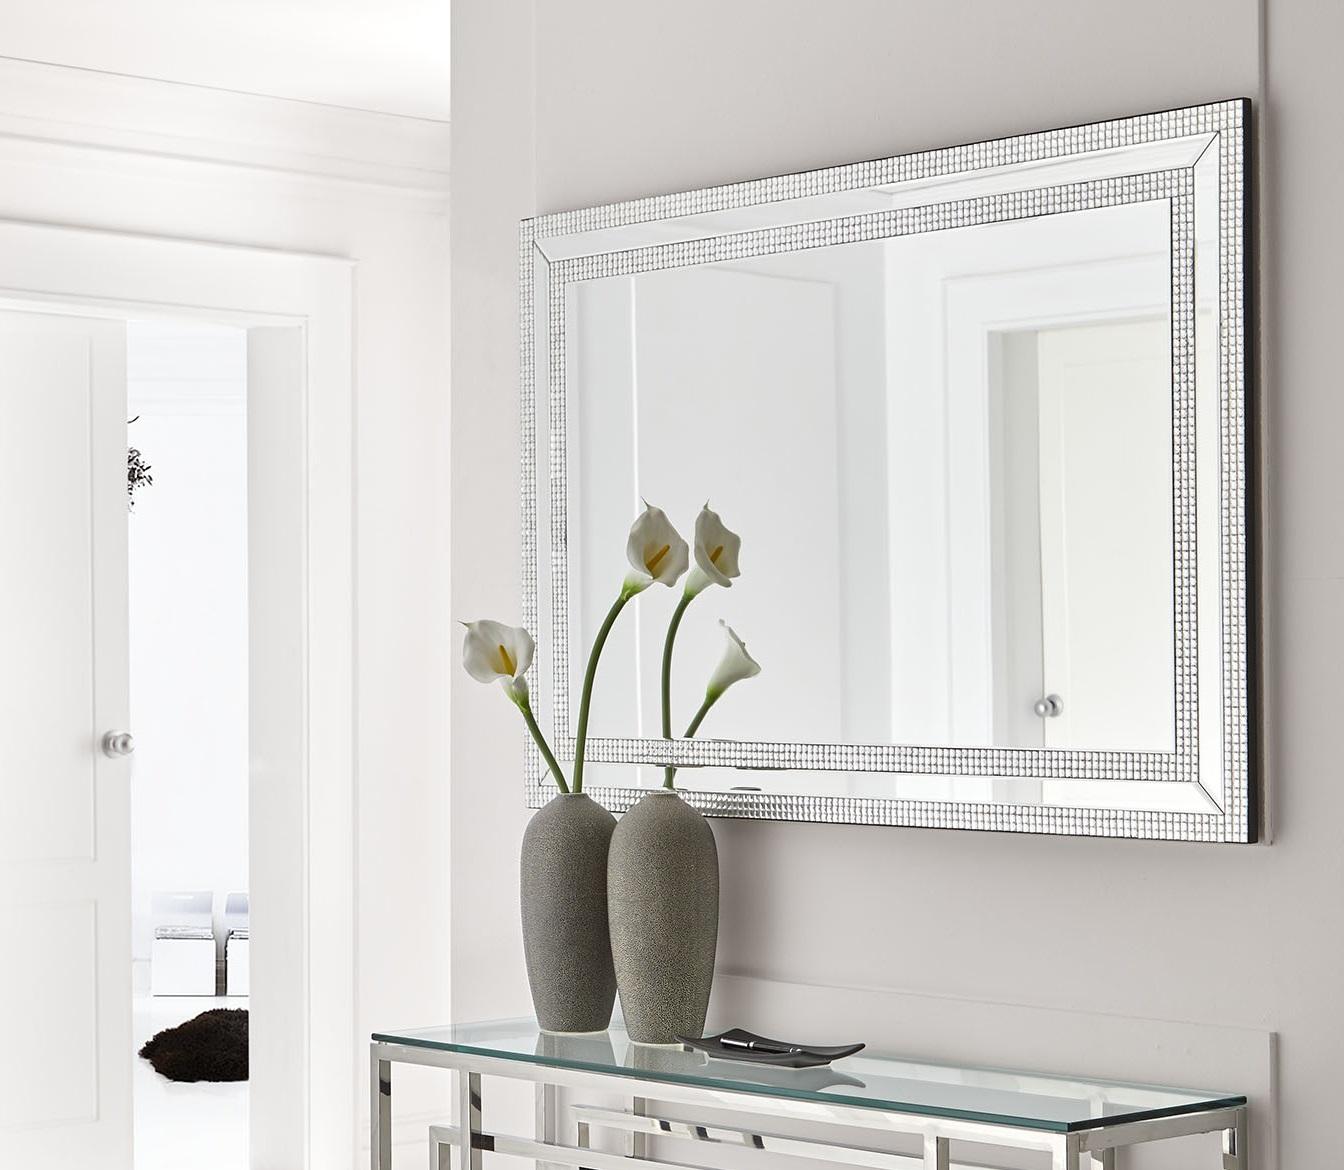 Espejo decorado cristales 120x80 E-127